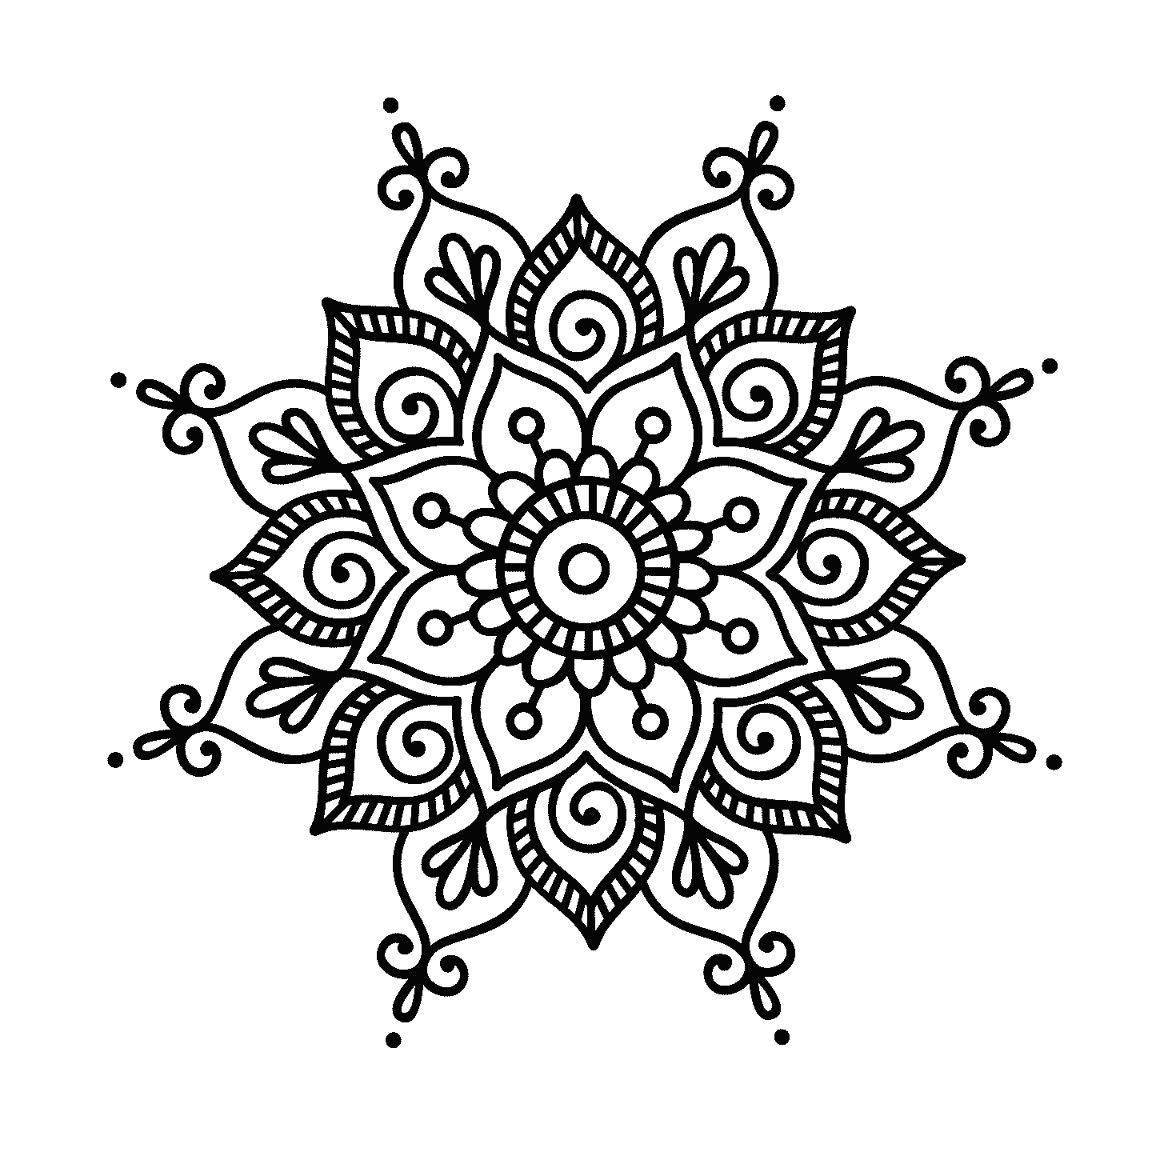 Pin von Danni Krisinger auf Mandalas | Pinterest | Silhouetten ...